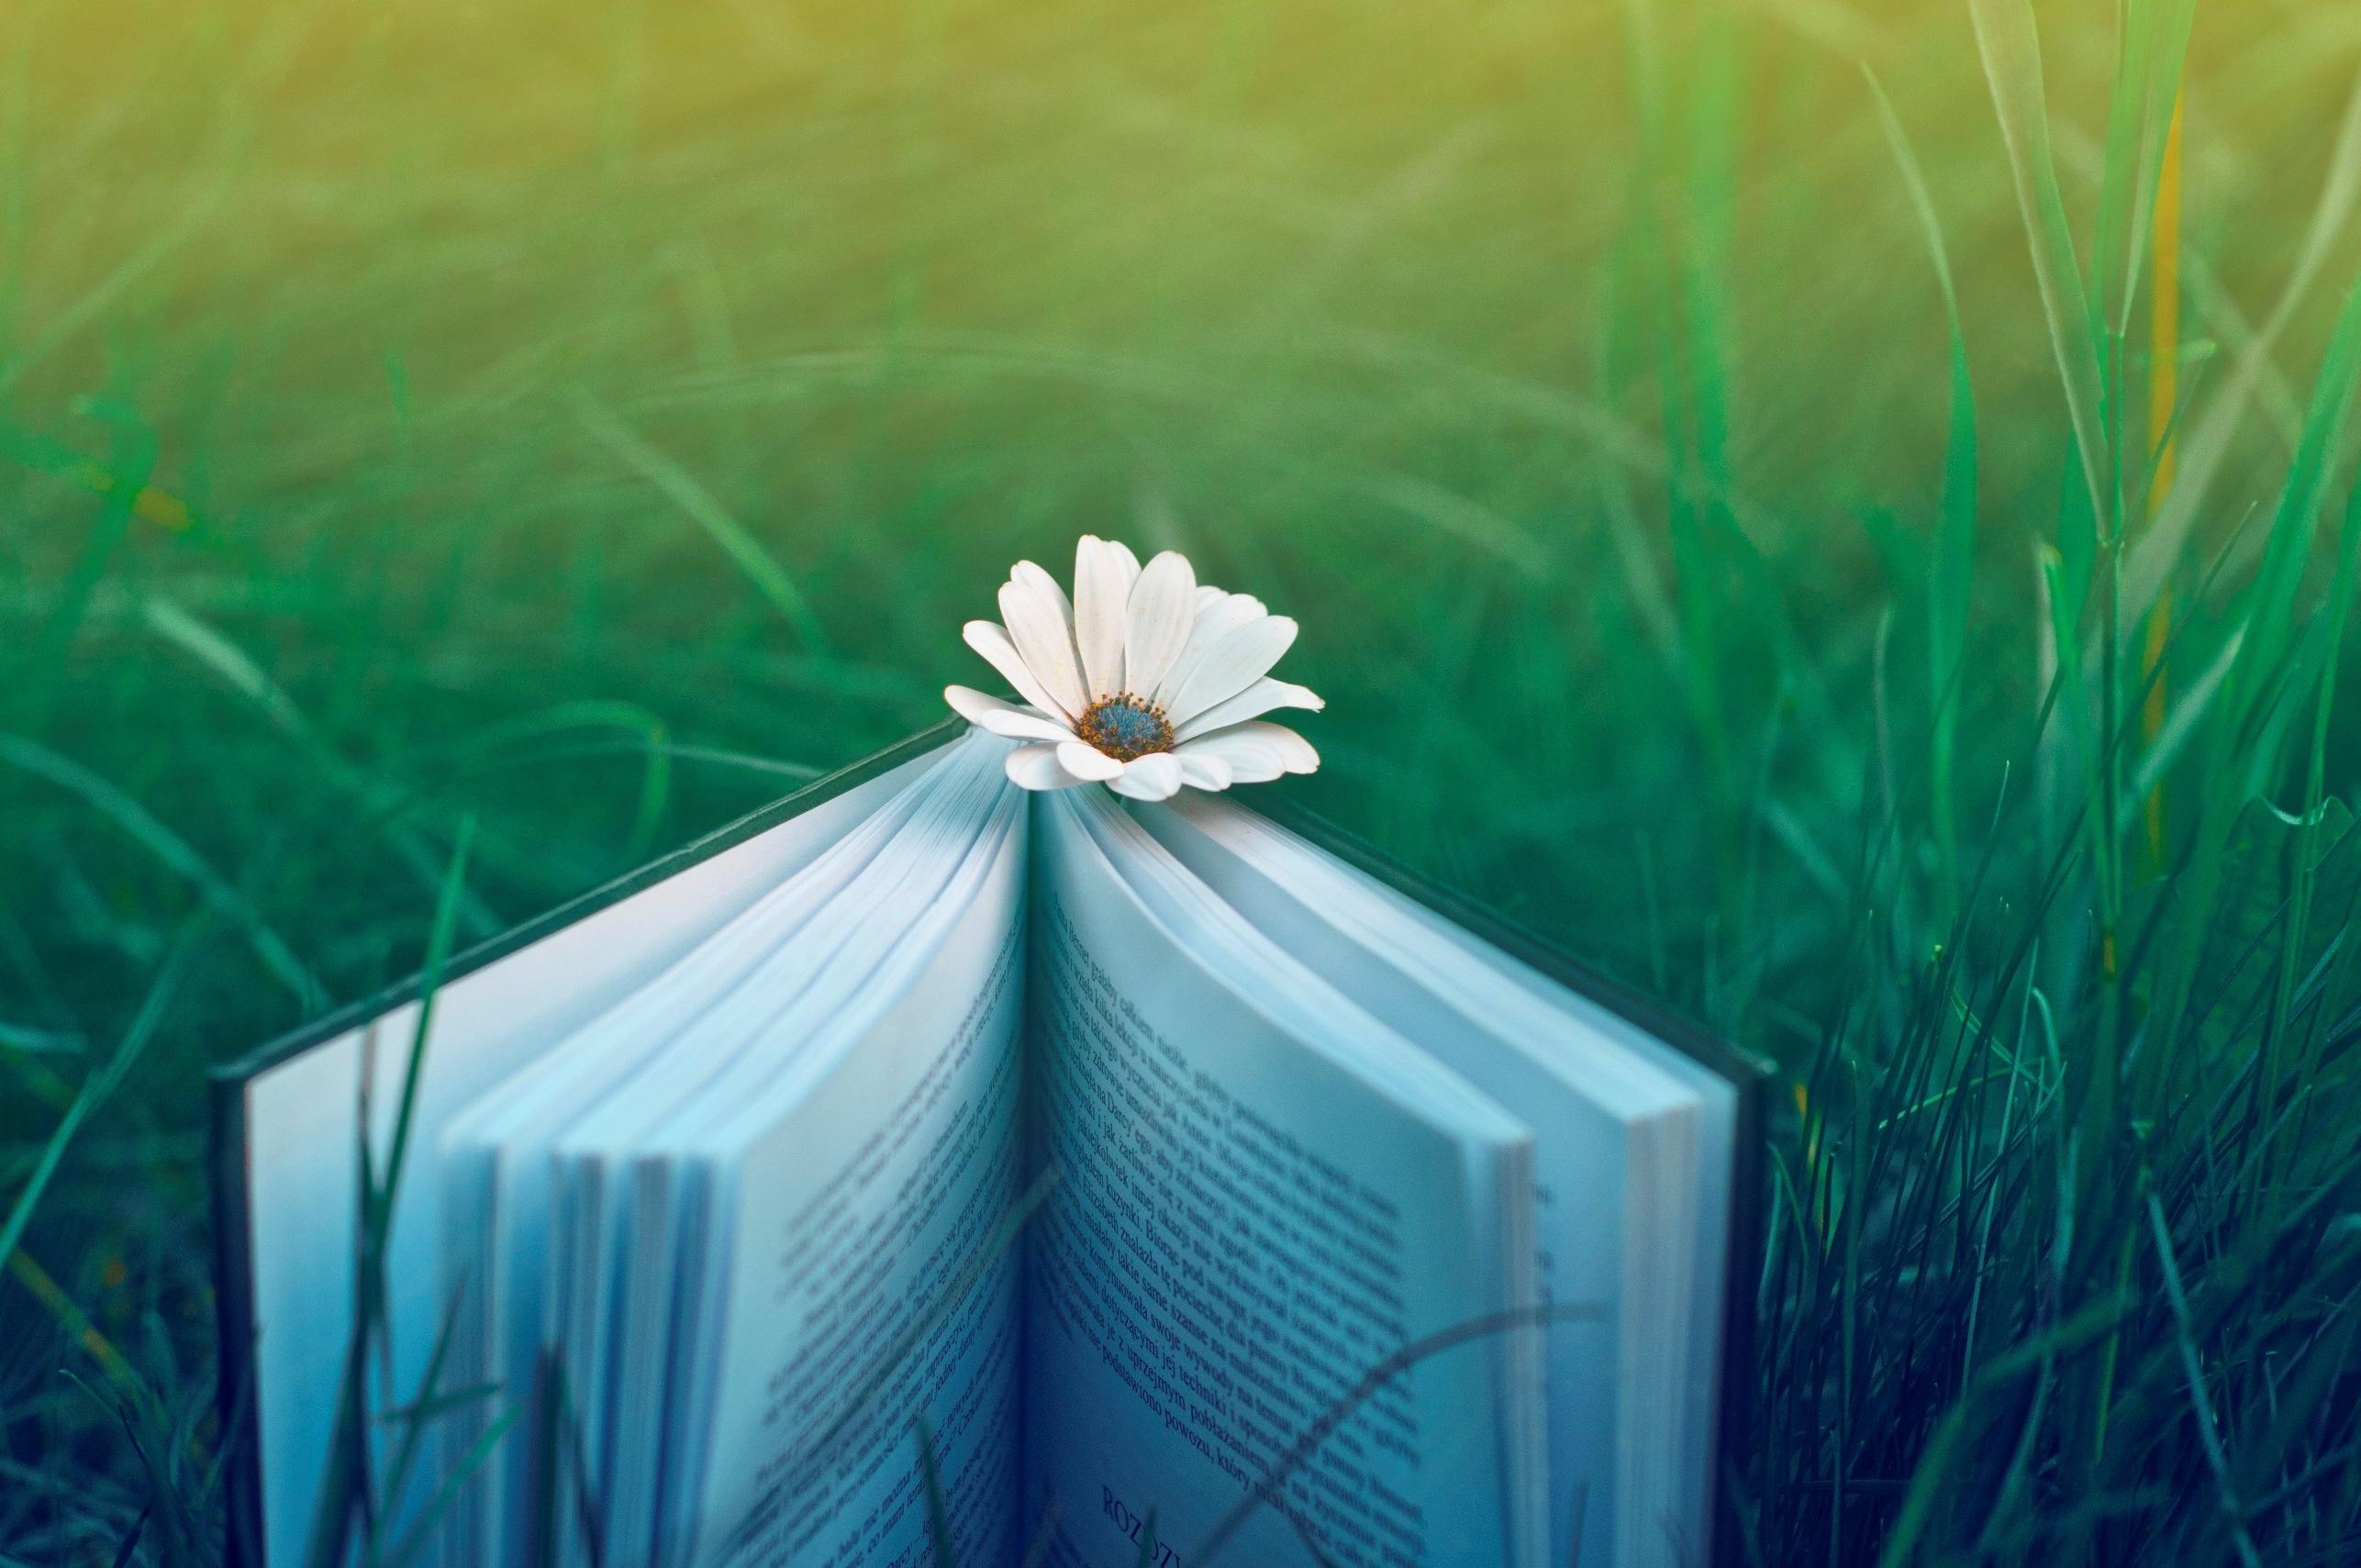 Sunlight Flowers Nature Grass Green Blue Light Color Leaf Flower Plant Mood Flora Book Computer Wallpaper